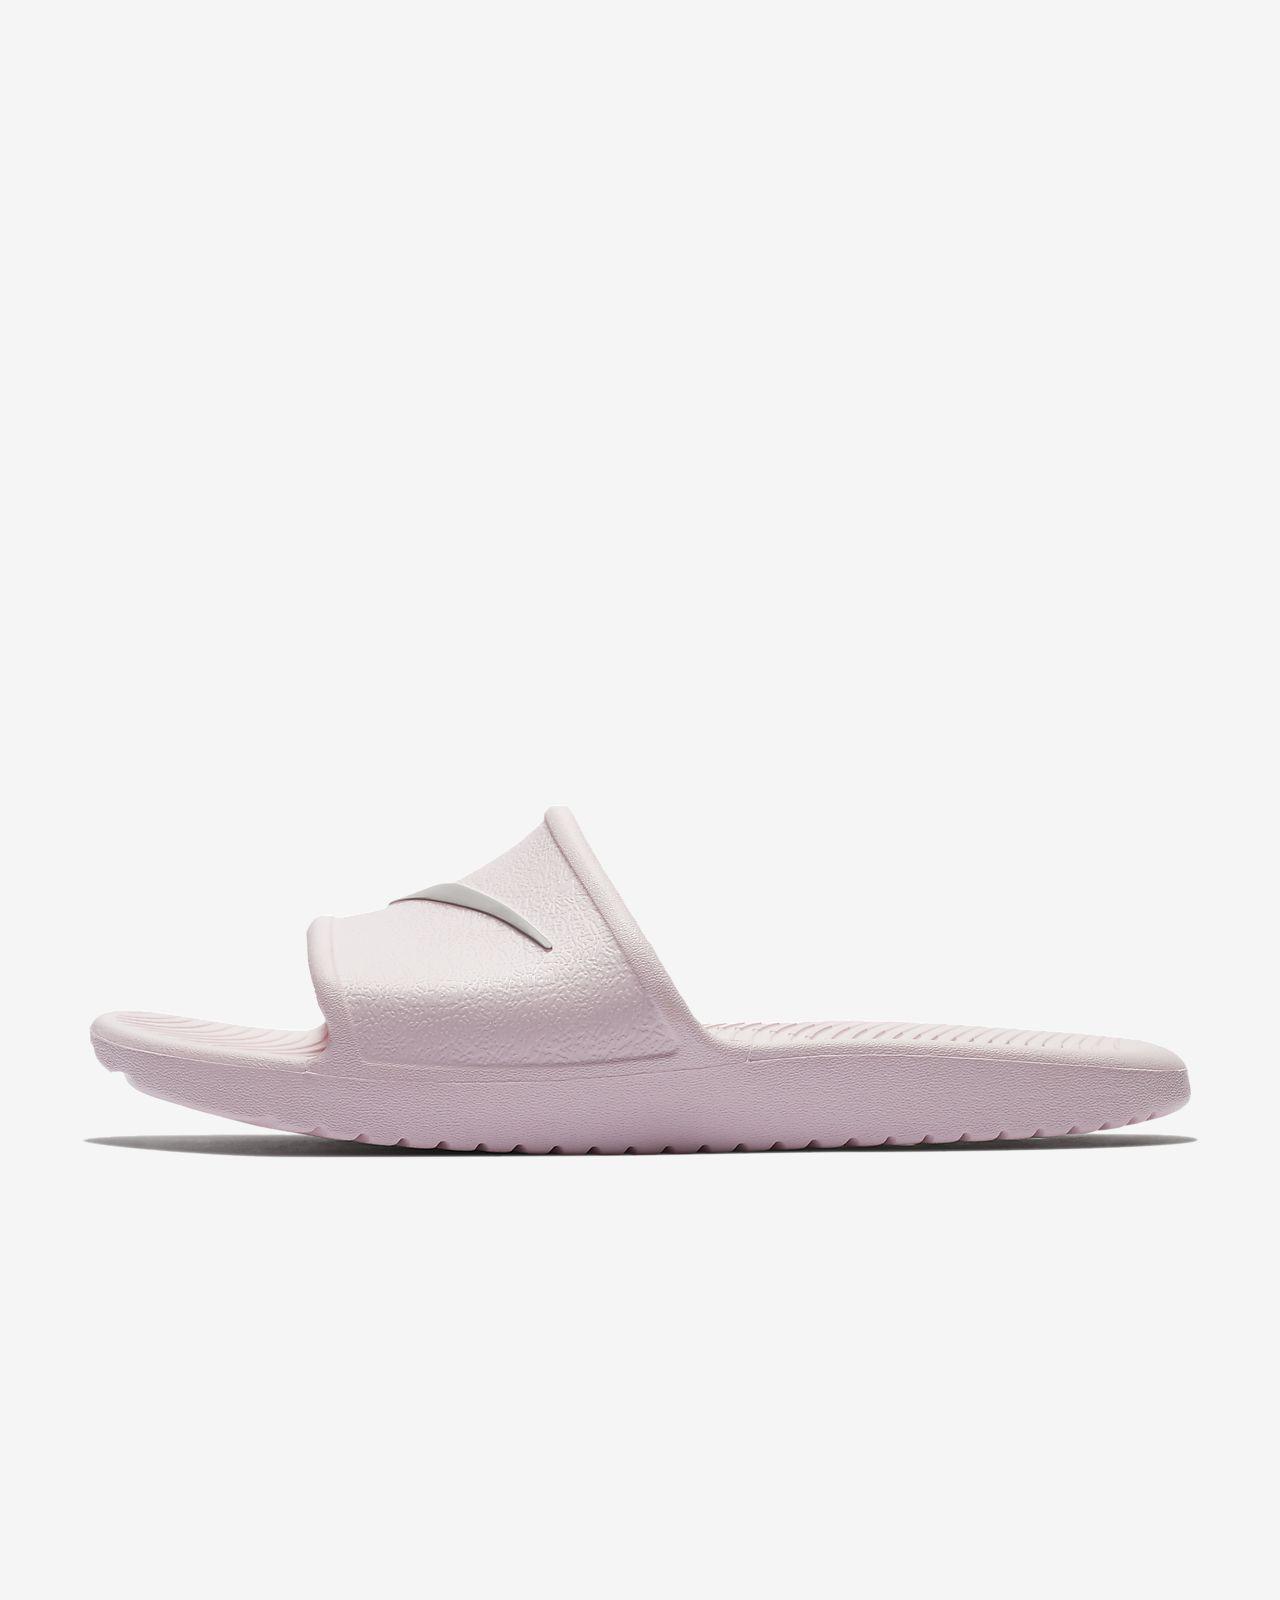 Nike Kawa Women's Slide